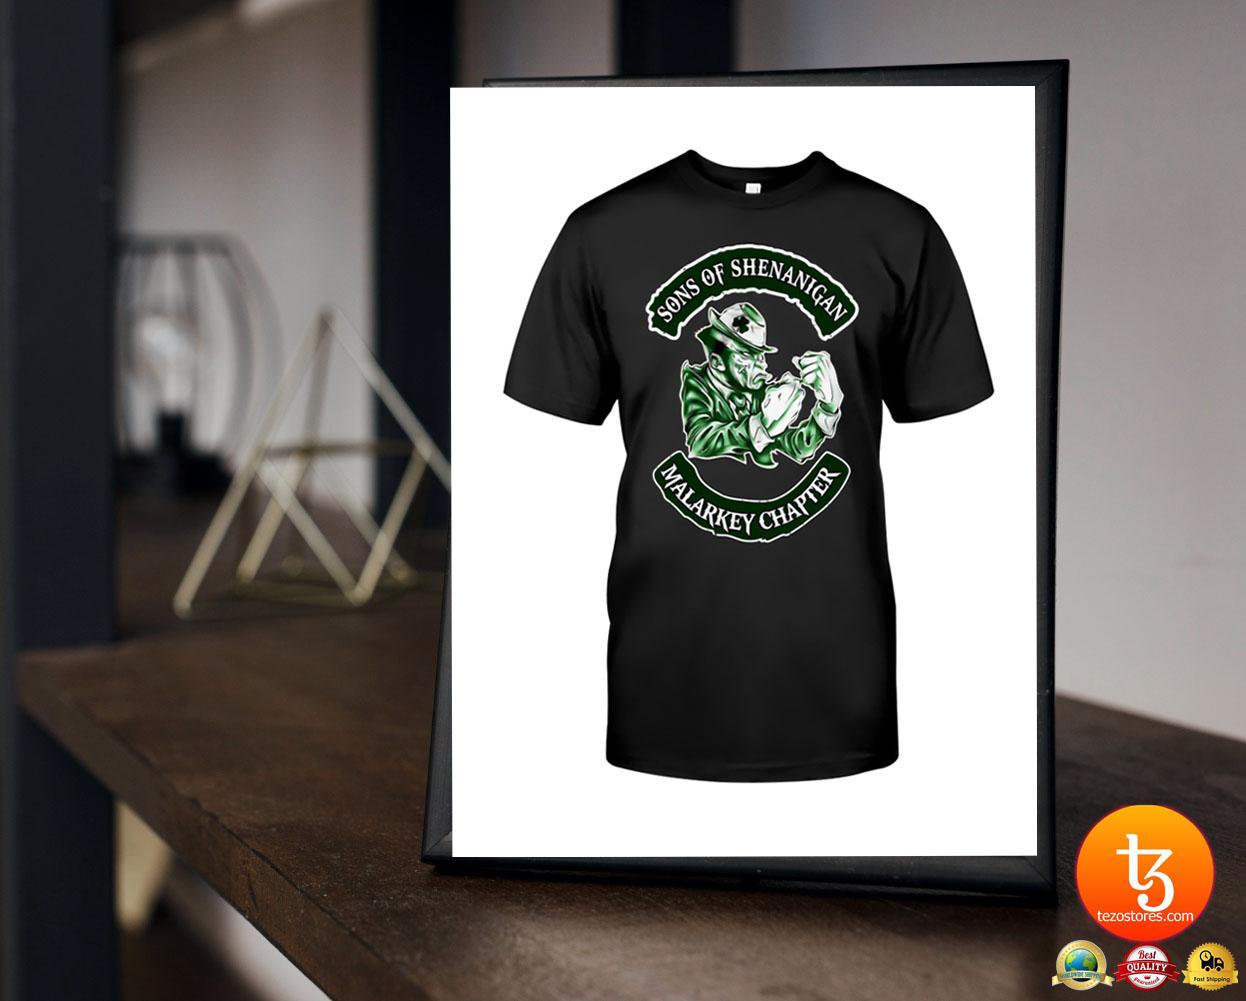 Sons of shenanigan malarkey chapter shirt